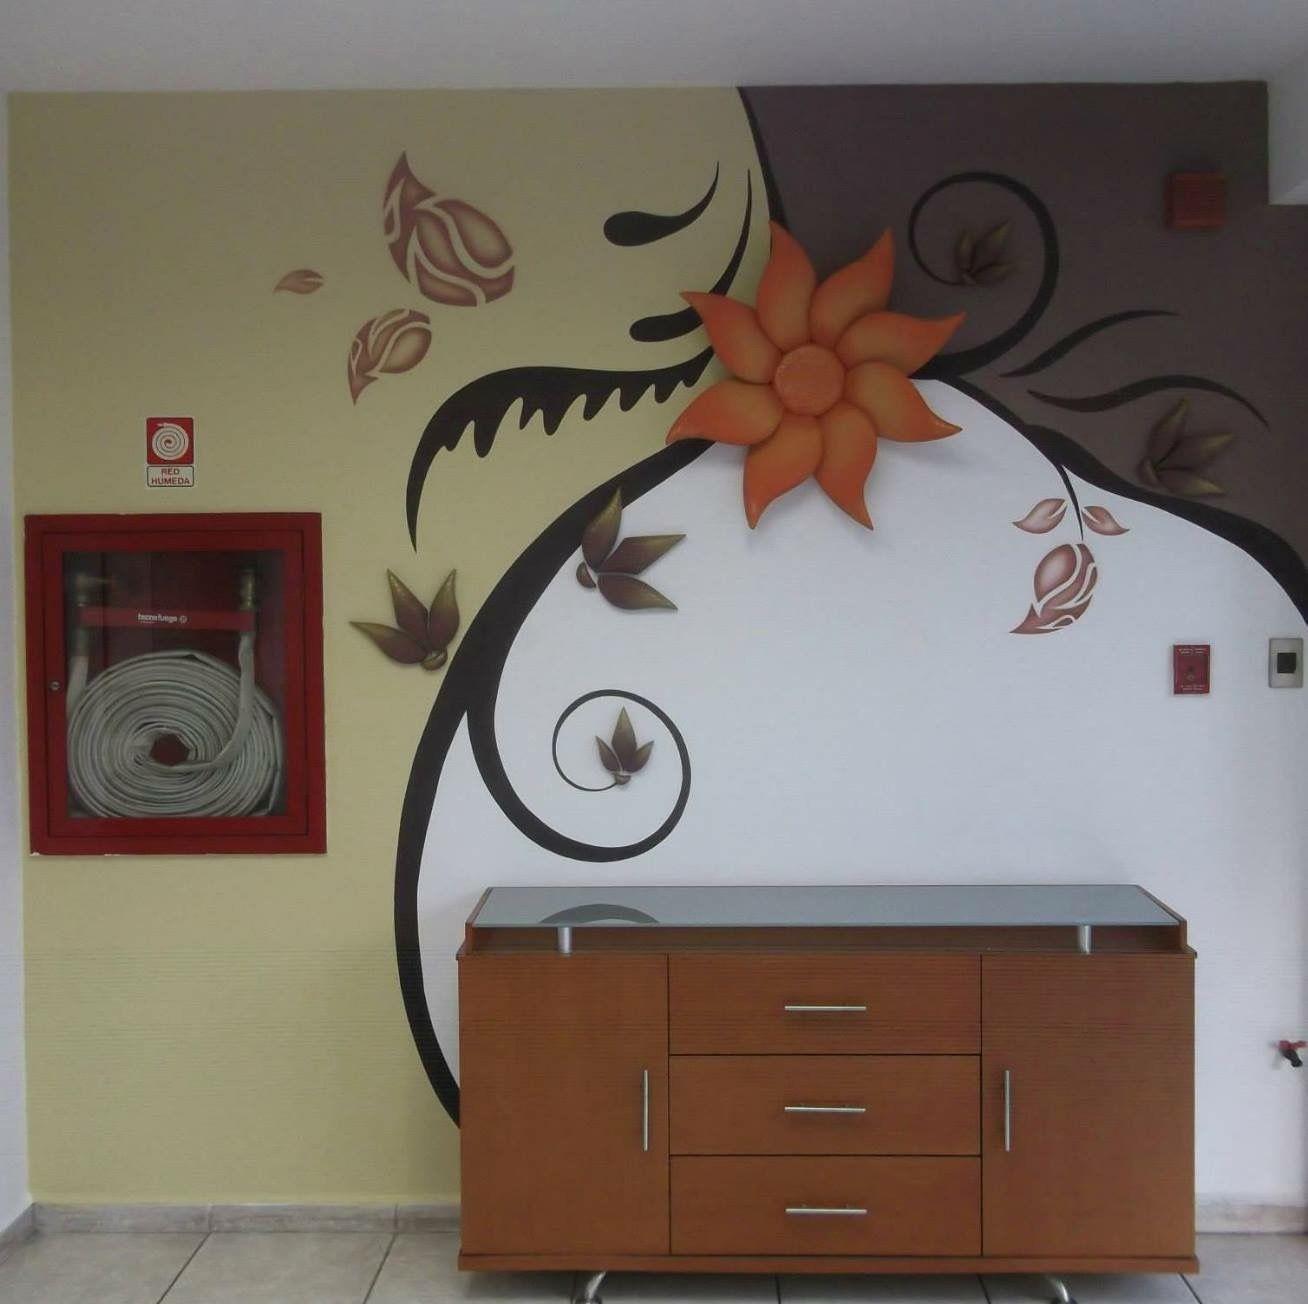 Pin de Jennifer LaBonte en Wall Murals | Pinterest | Murales ...